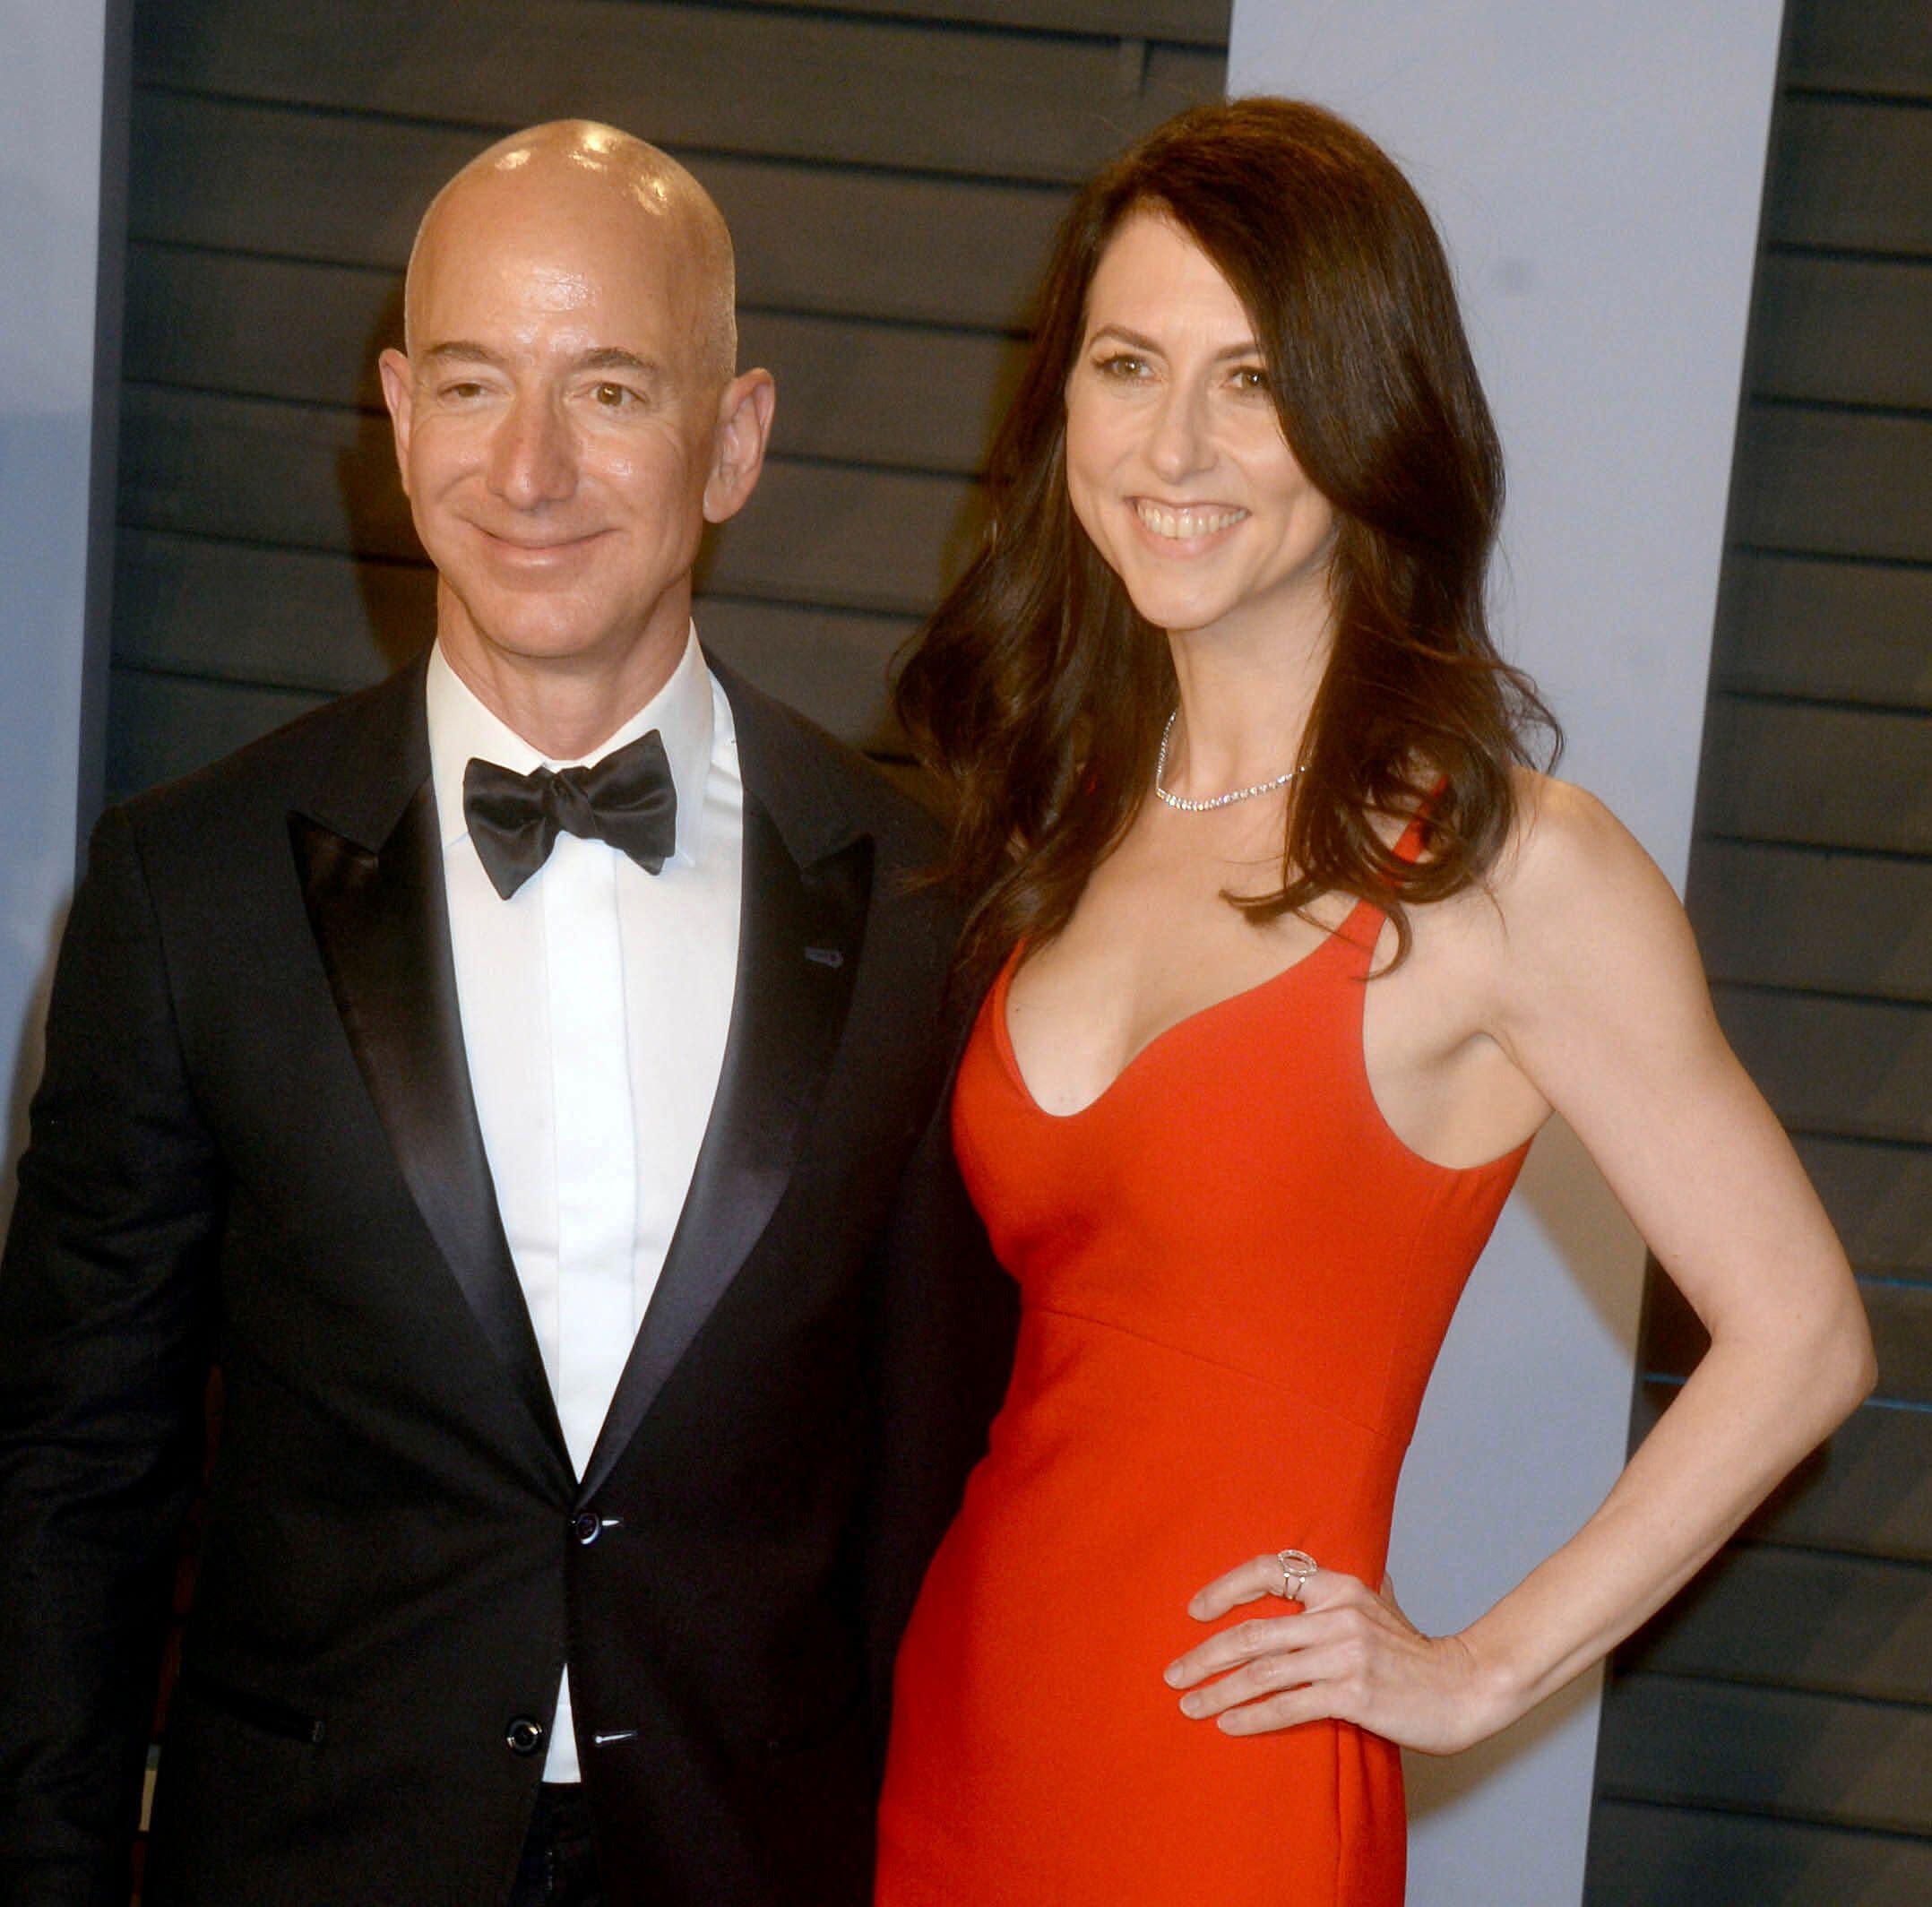 Mackenzie Bezos To Give Half Of Her 36 Billion Fortune To